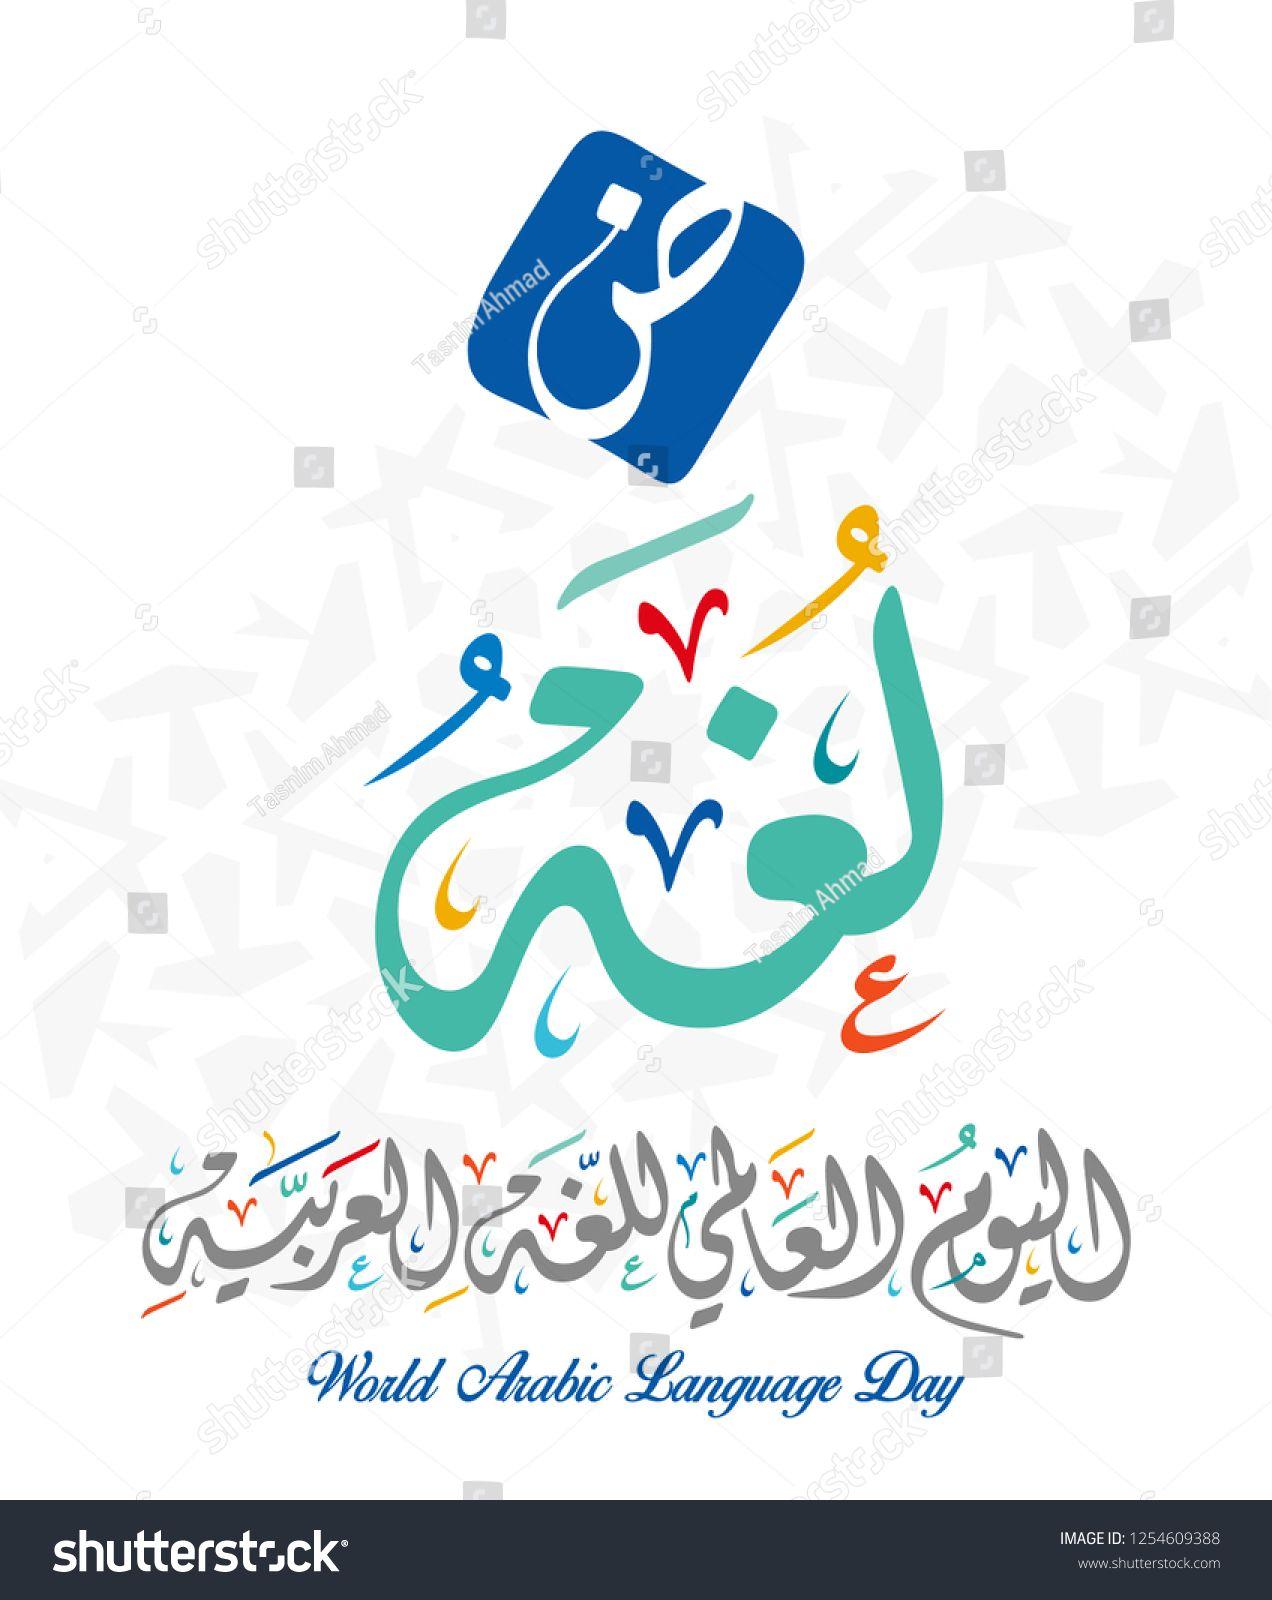 International Language Day Logo In Arabic Calligraphy Design Arabic Language Day Greet Arabic Calligraphy Design International Language Day Arabic Calligraphy